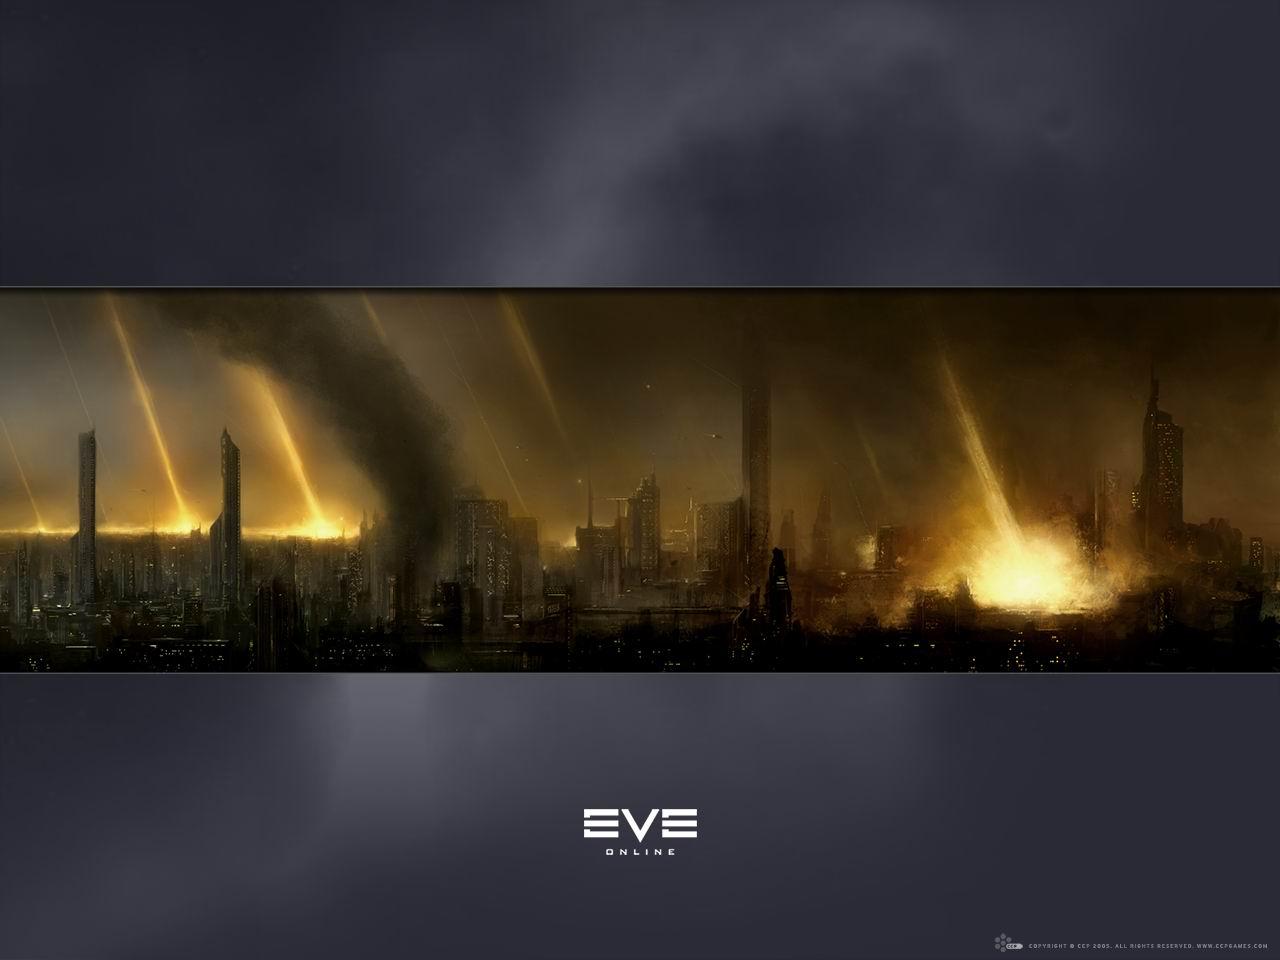 EVE Online 精美壁纸